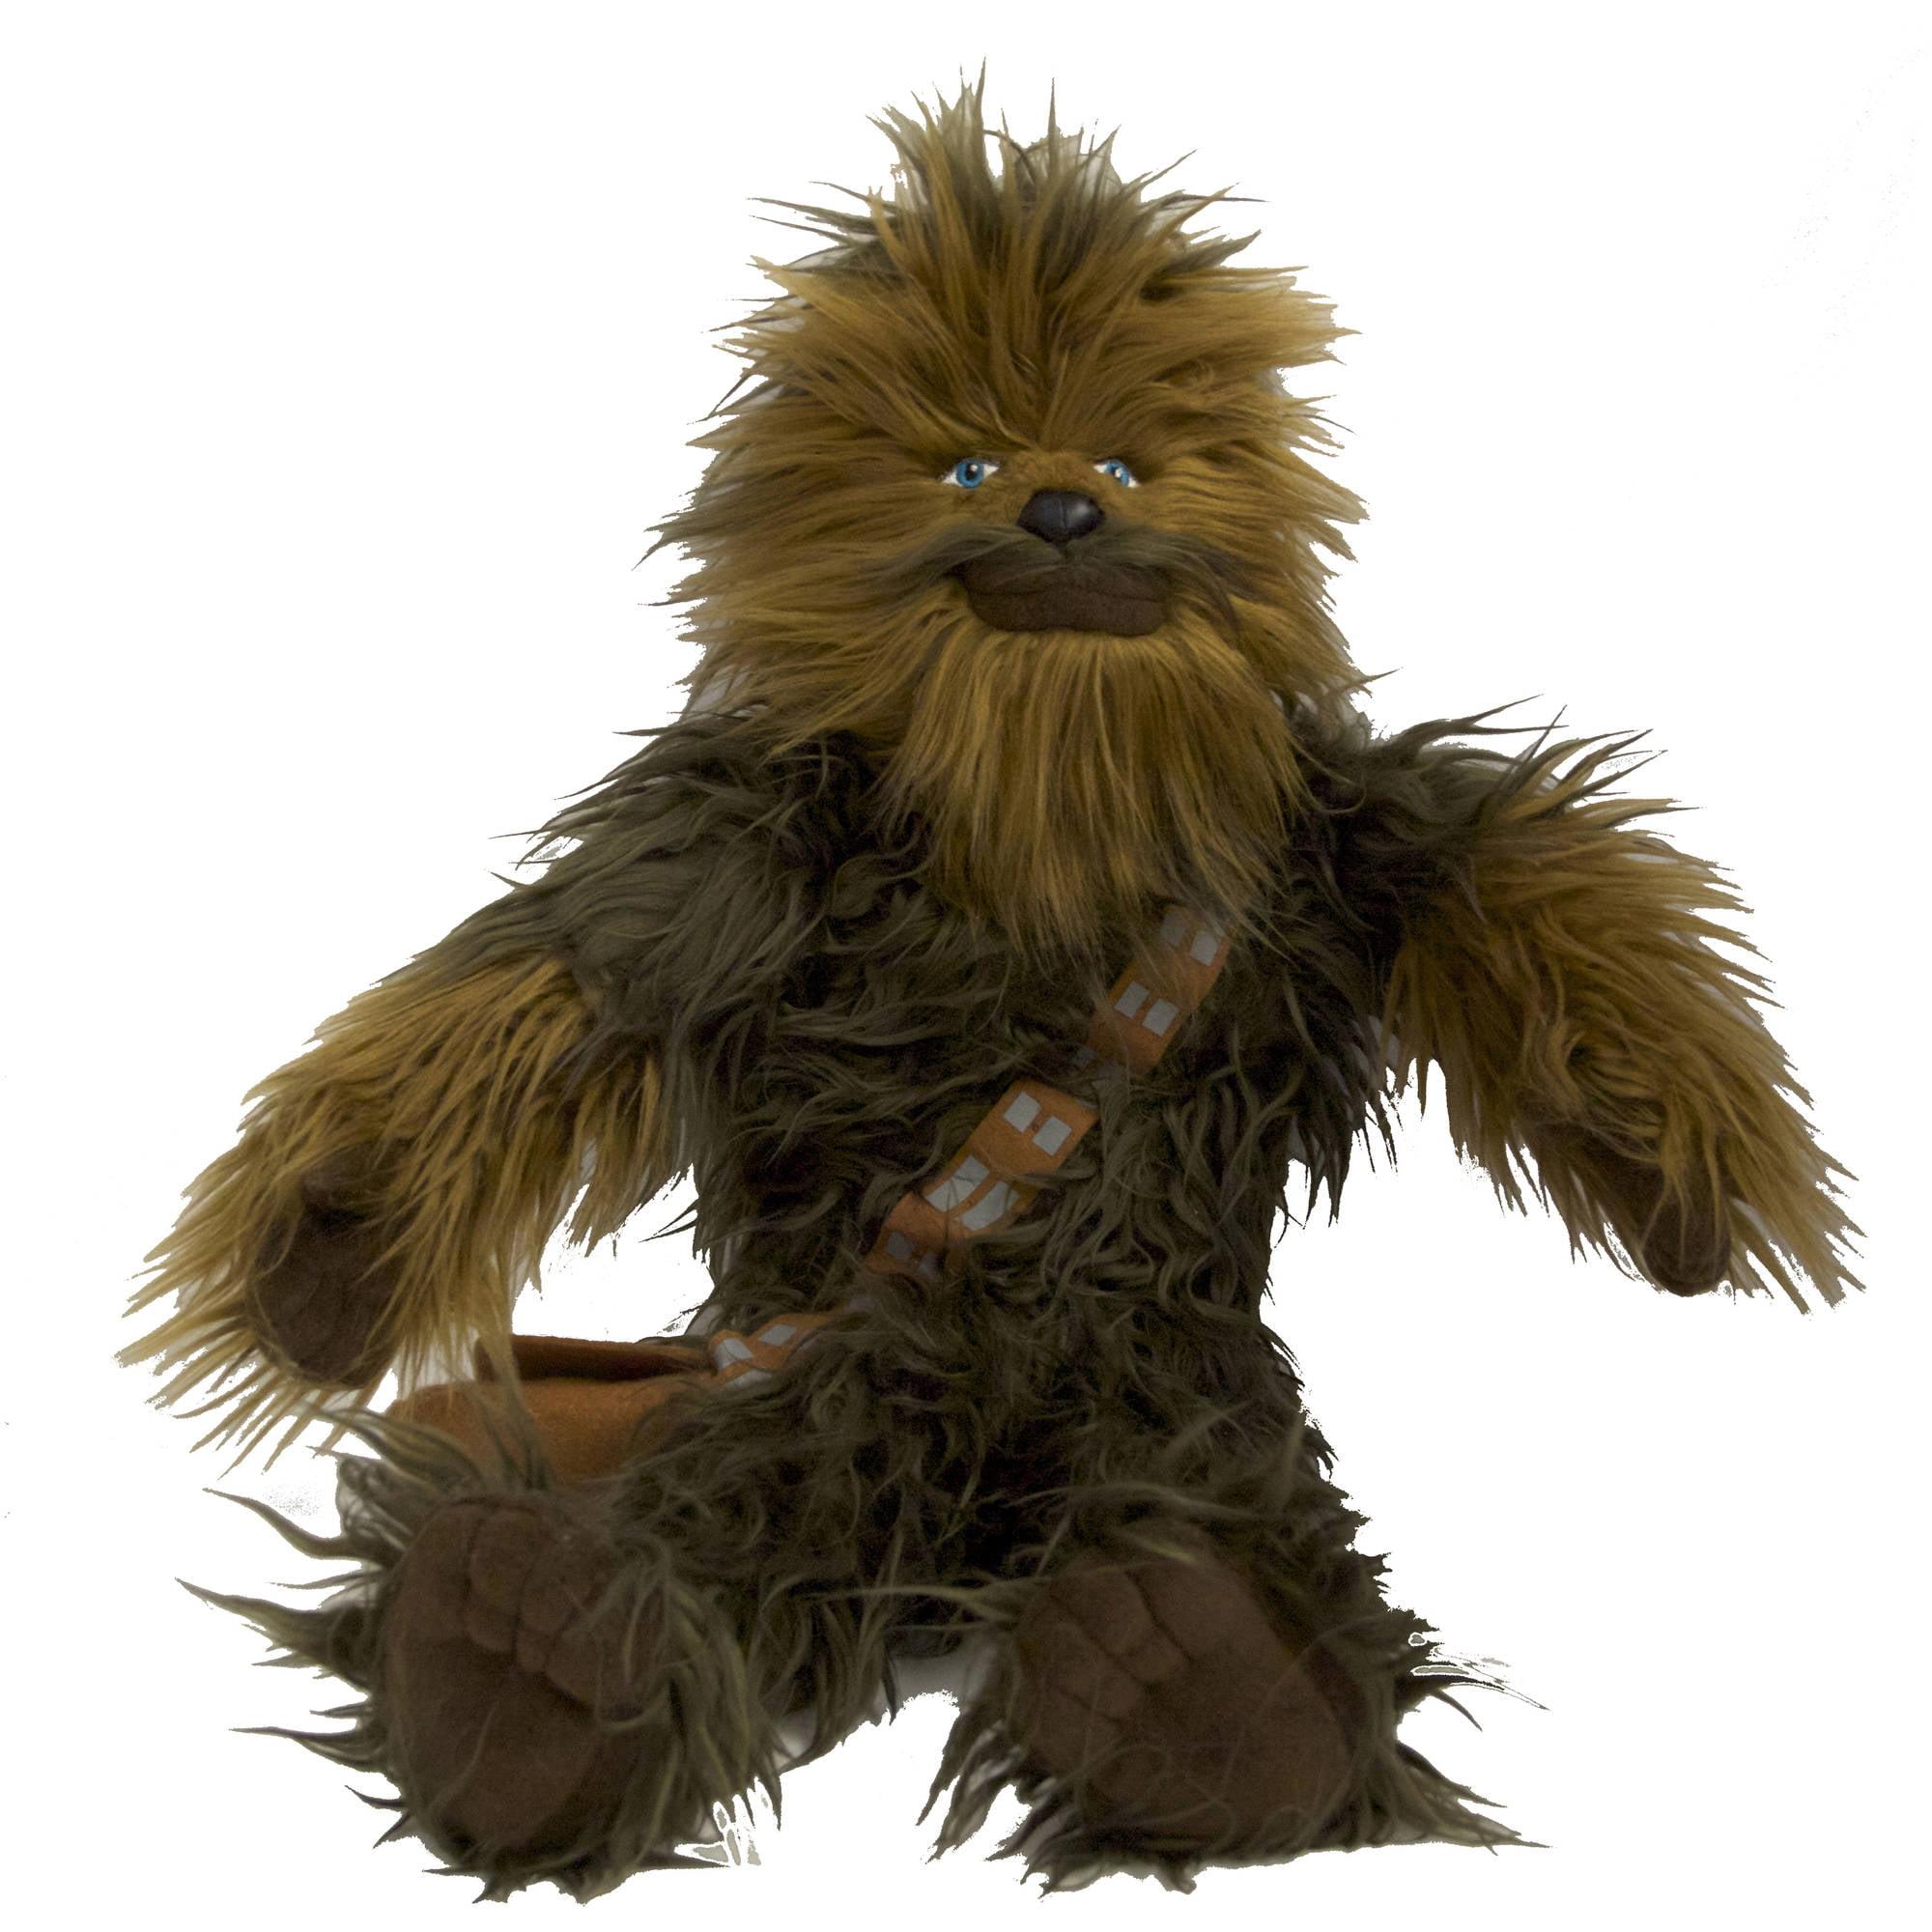 Star Wars Chewbacca Pillowbuddy